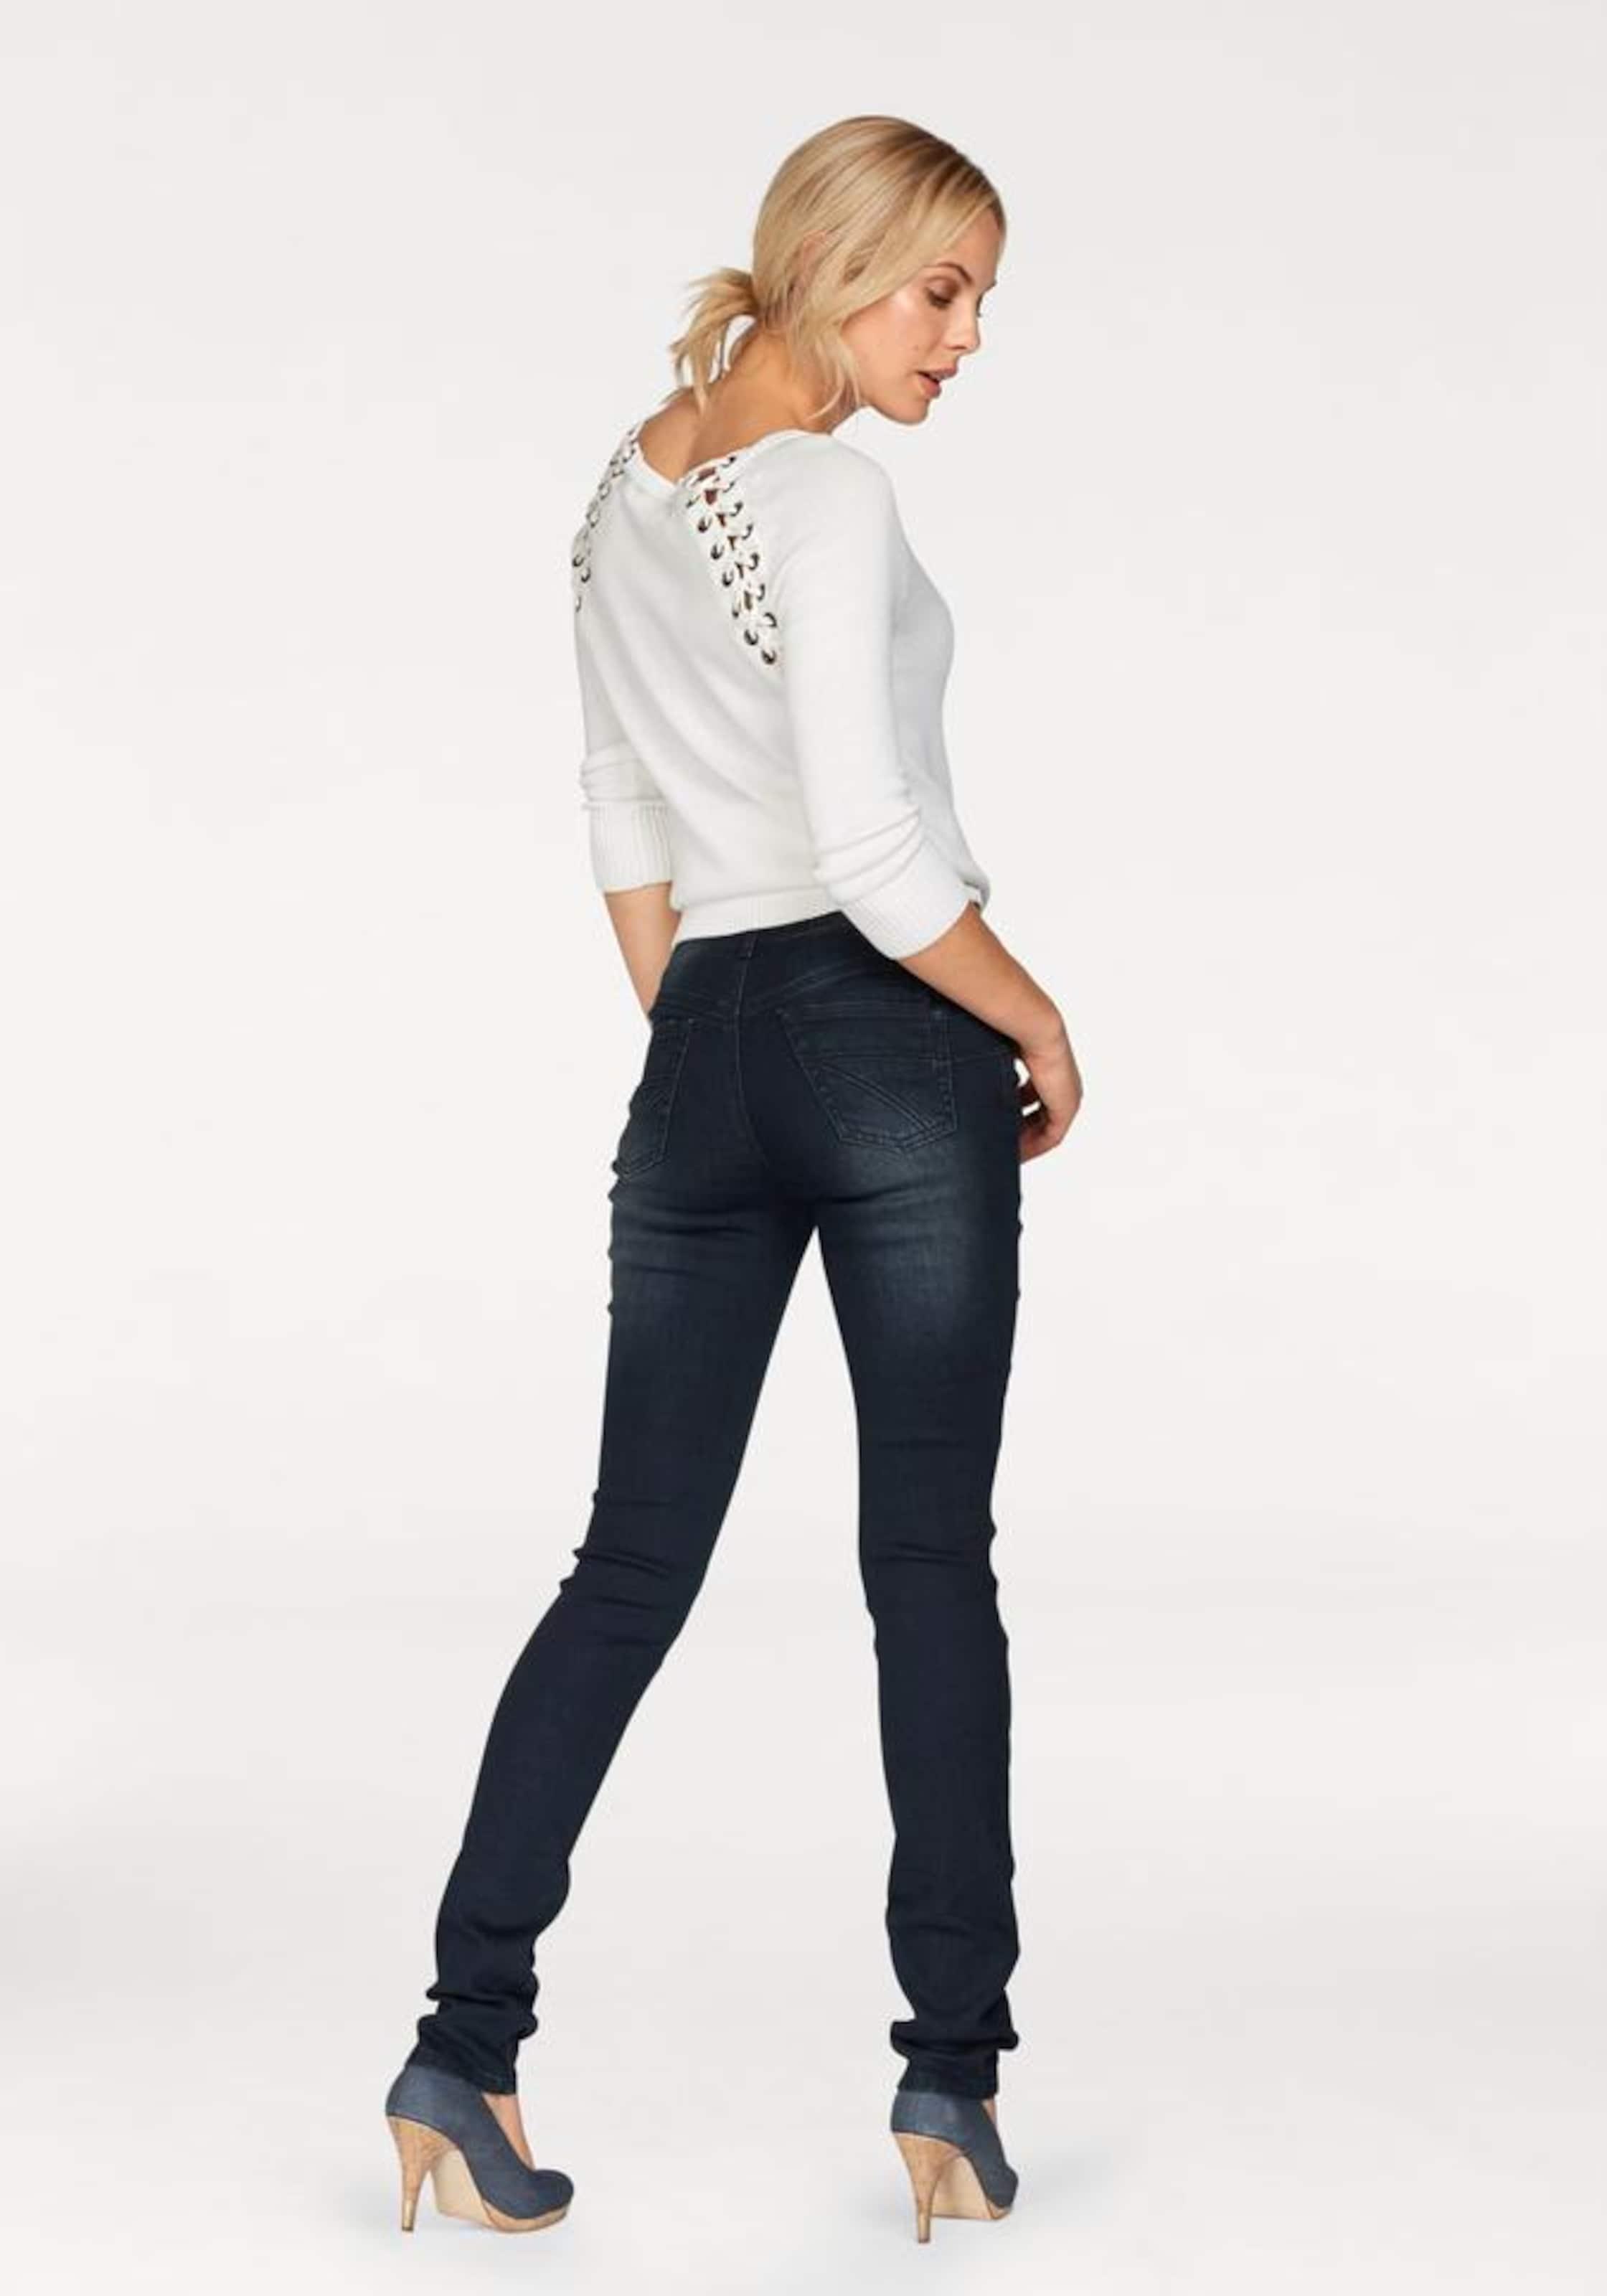 ARIZONA Skinny-fit-Jeans 'Shaping' Geniue Händler Online Neuesten Kollektionen VyNhqiKgl